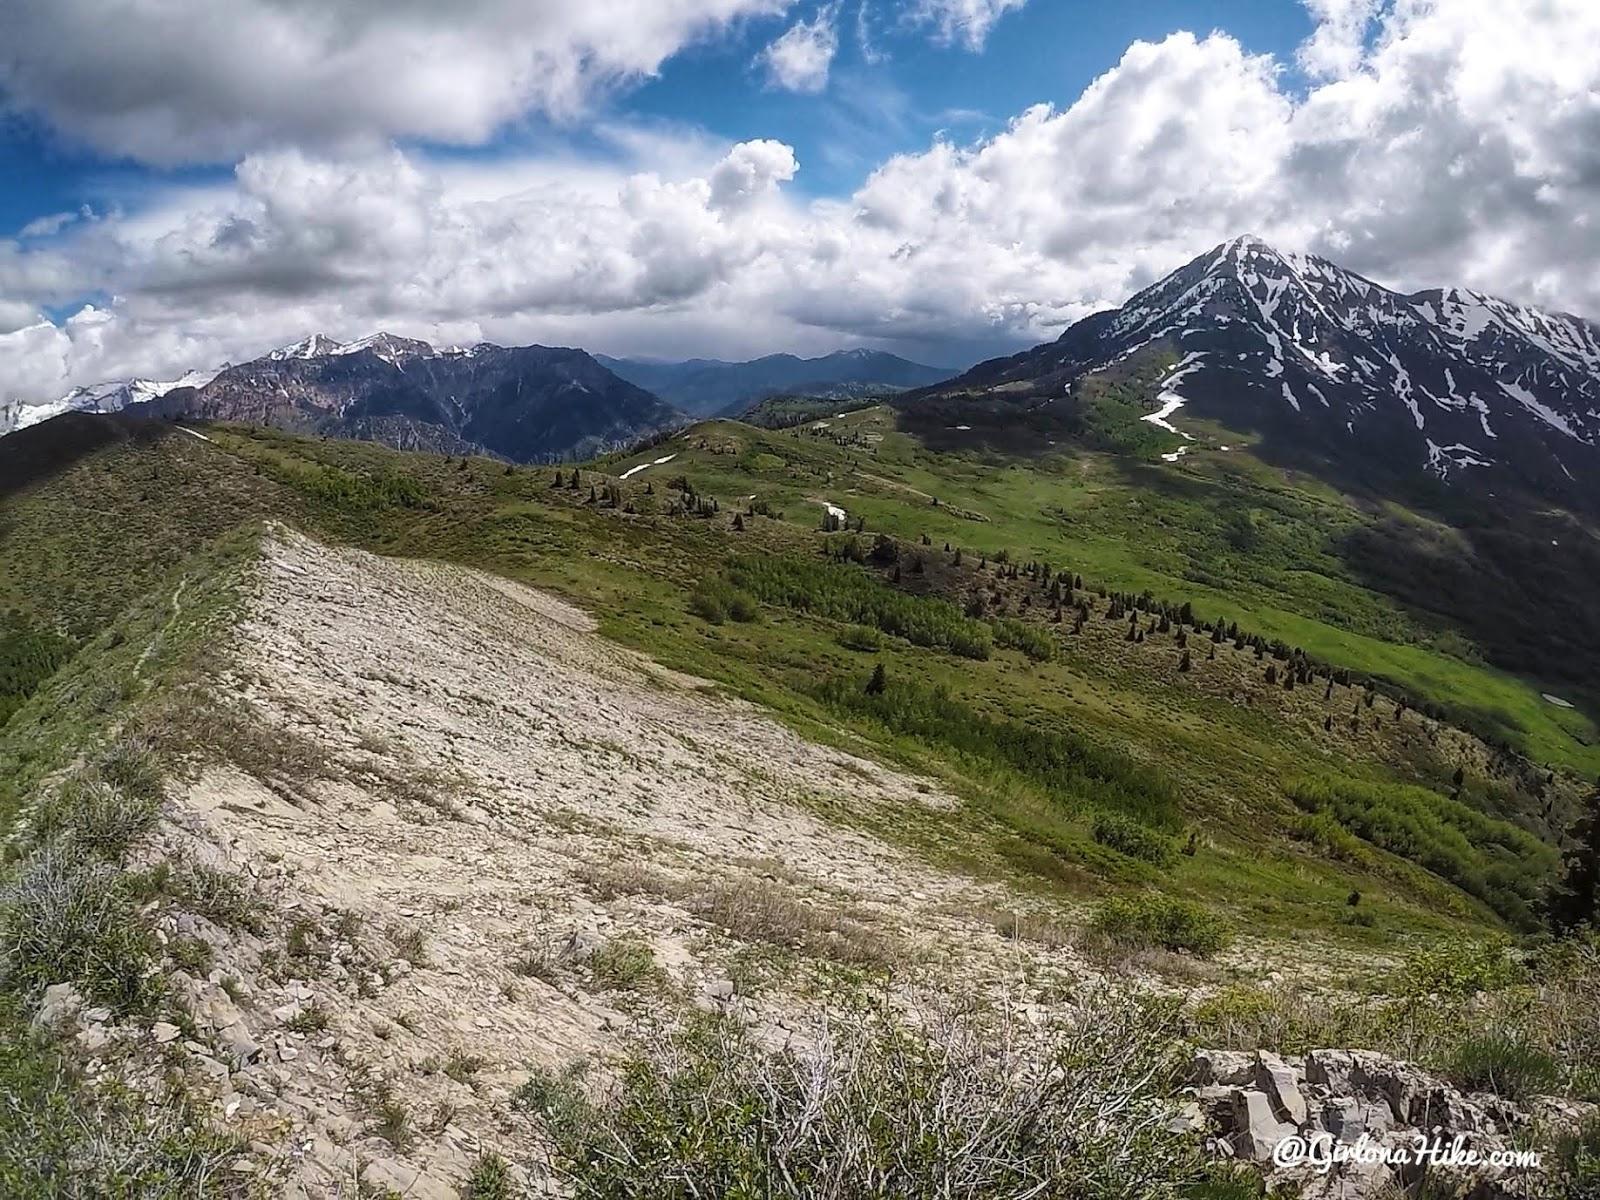 Hiking Mahogany Mountain, Utah county, utah peak baggers, hiking in utah with dogs, Utah's best peaks